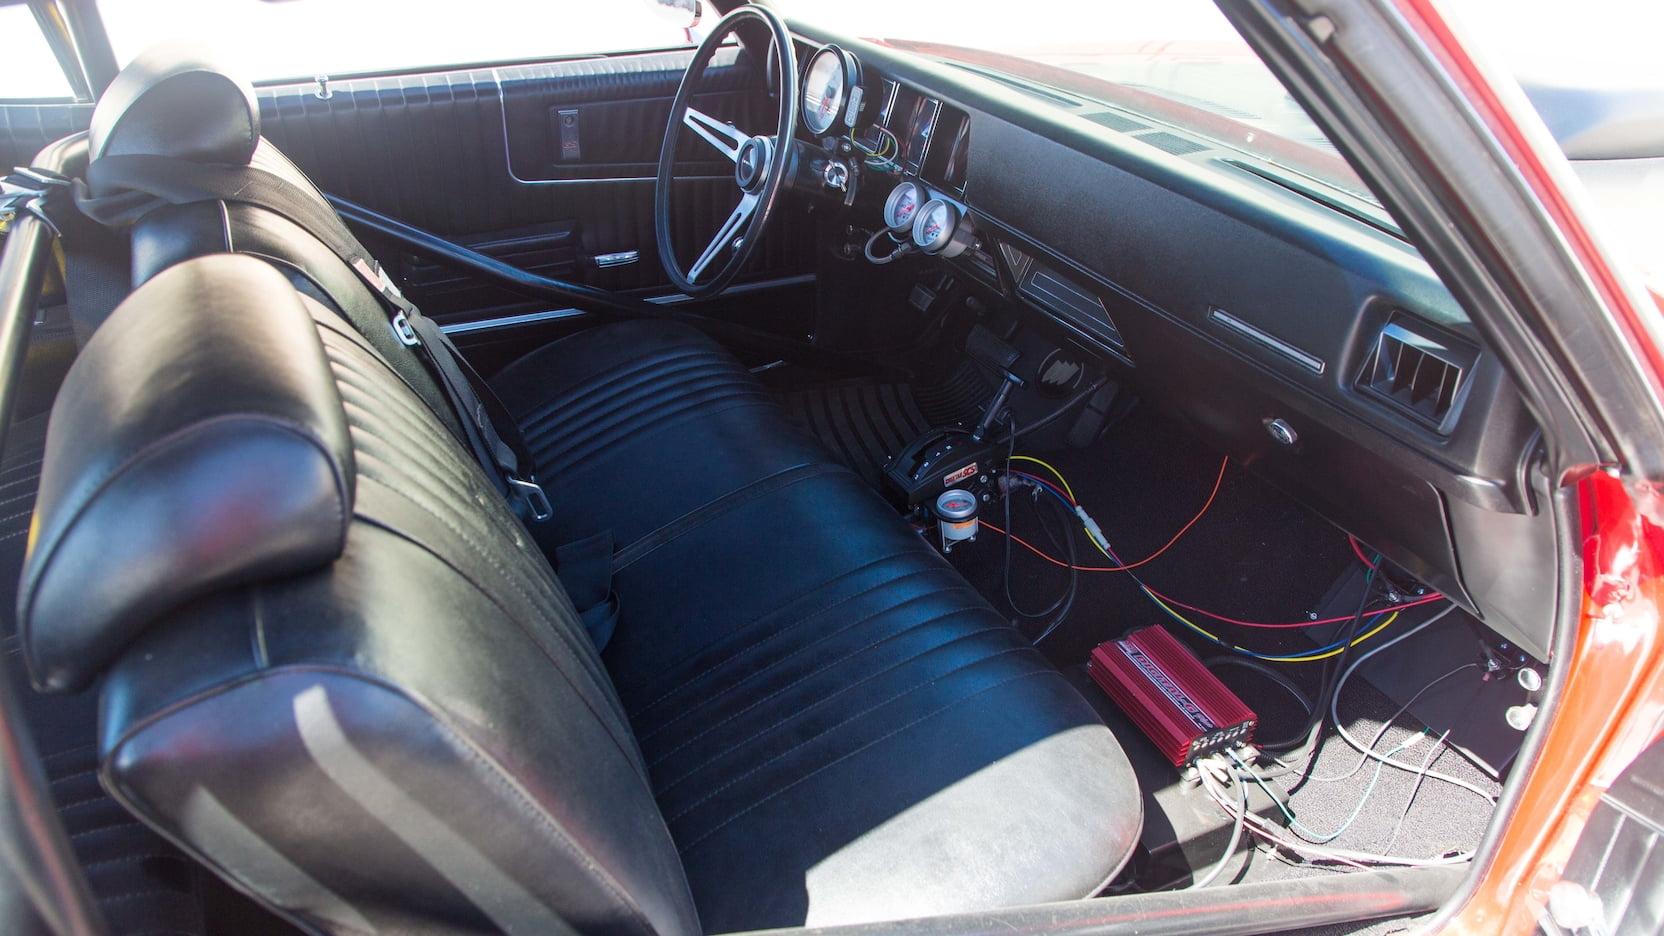 1970 Buick GS Stage II passenger interior